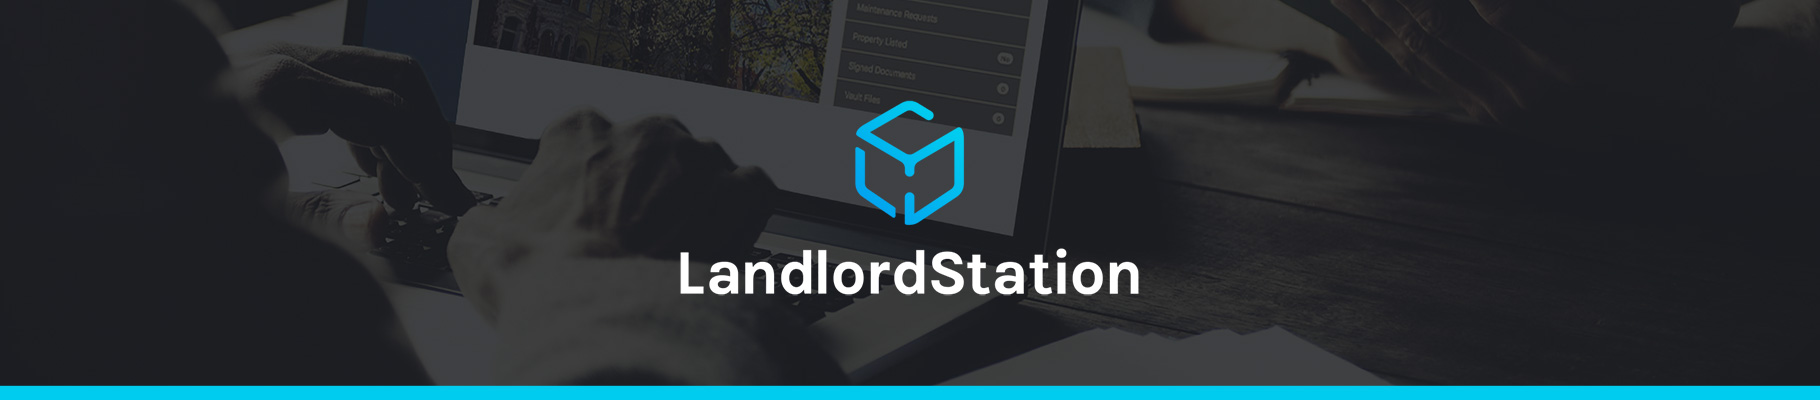 graphic of LandlordStation brand wide banner